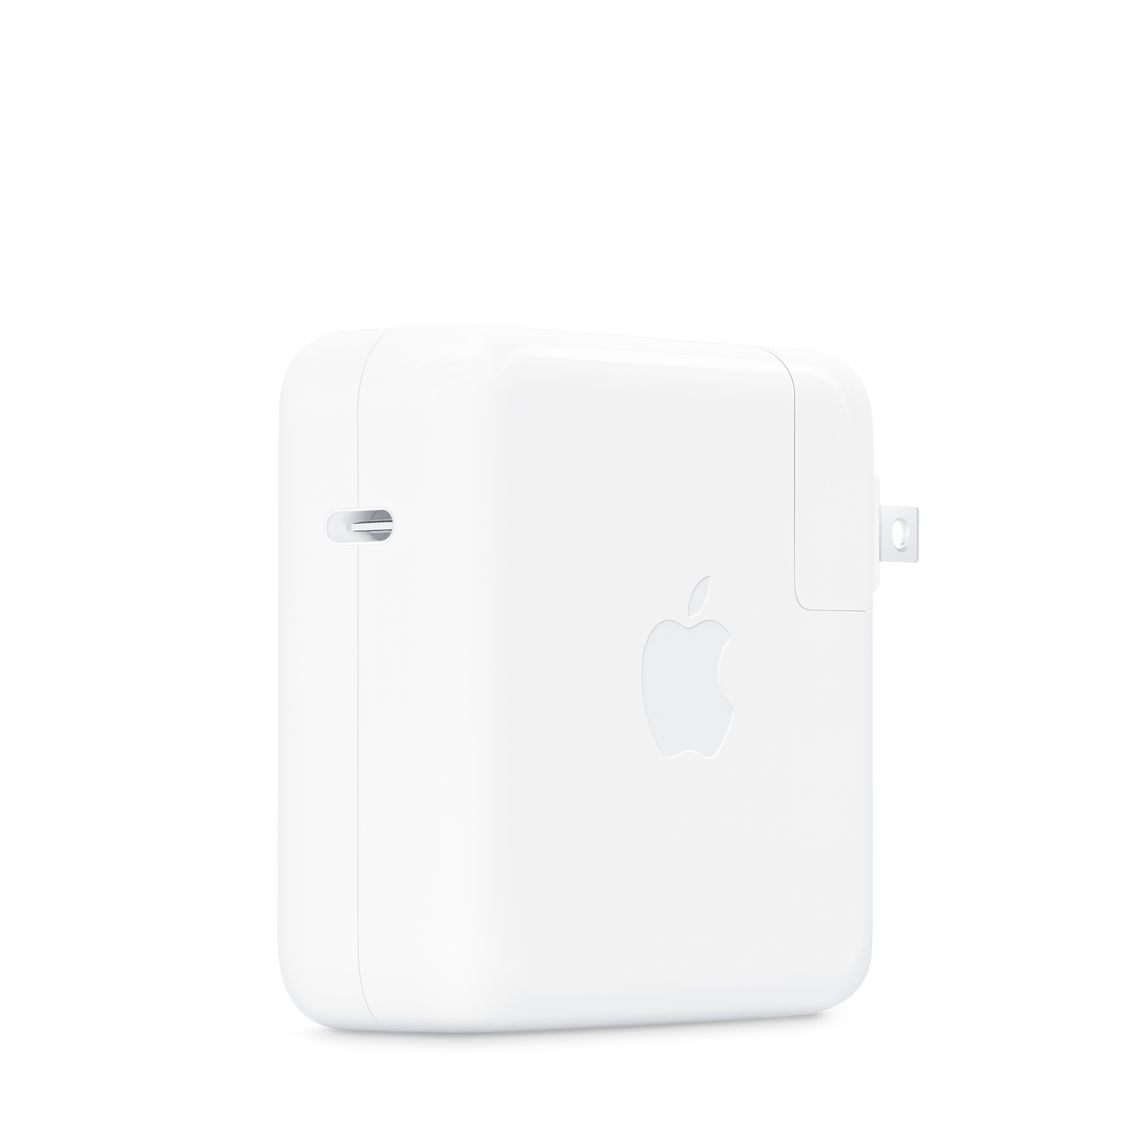 61w Usb C Power Adapter Apple